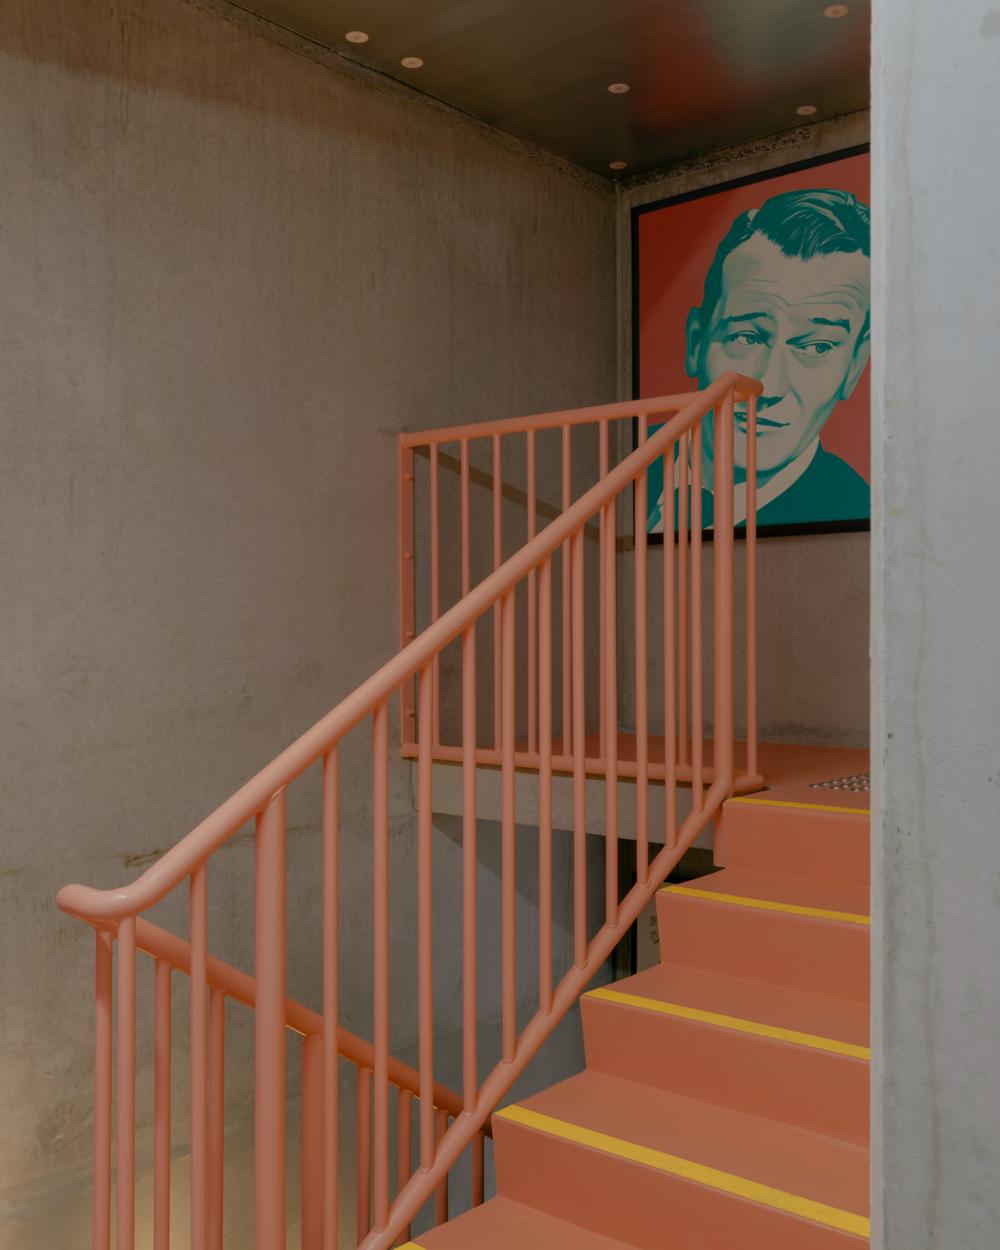 Colourful stair design